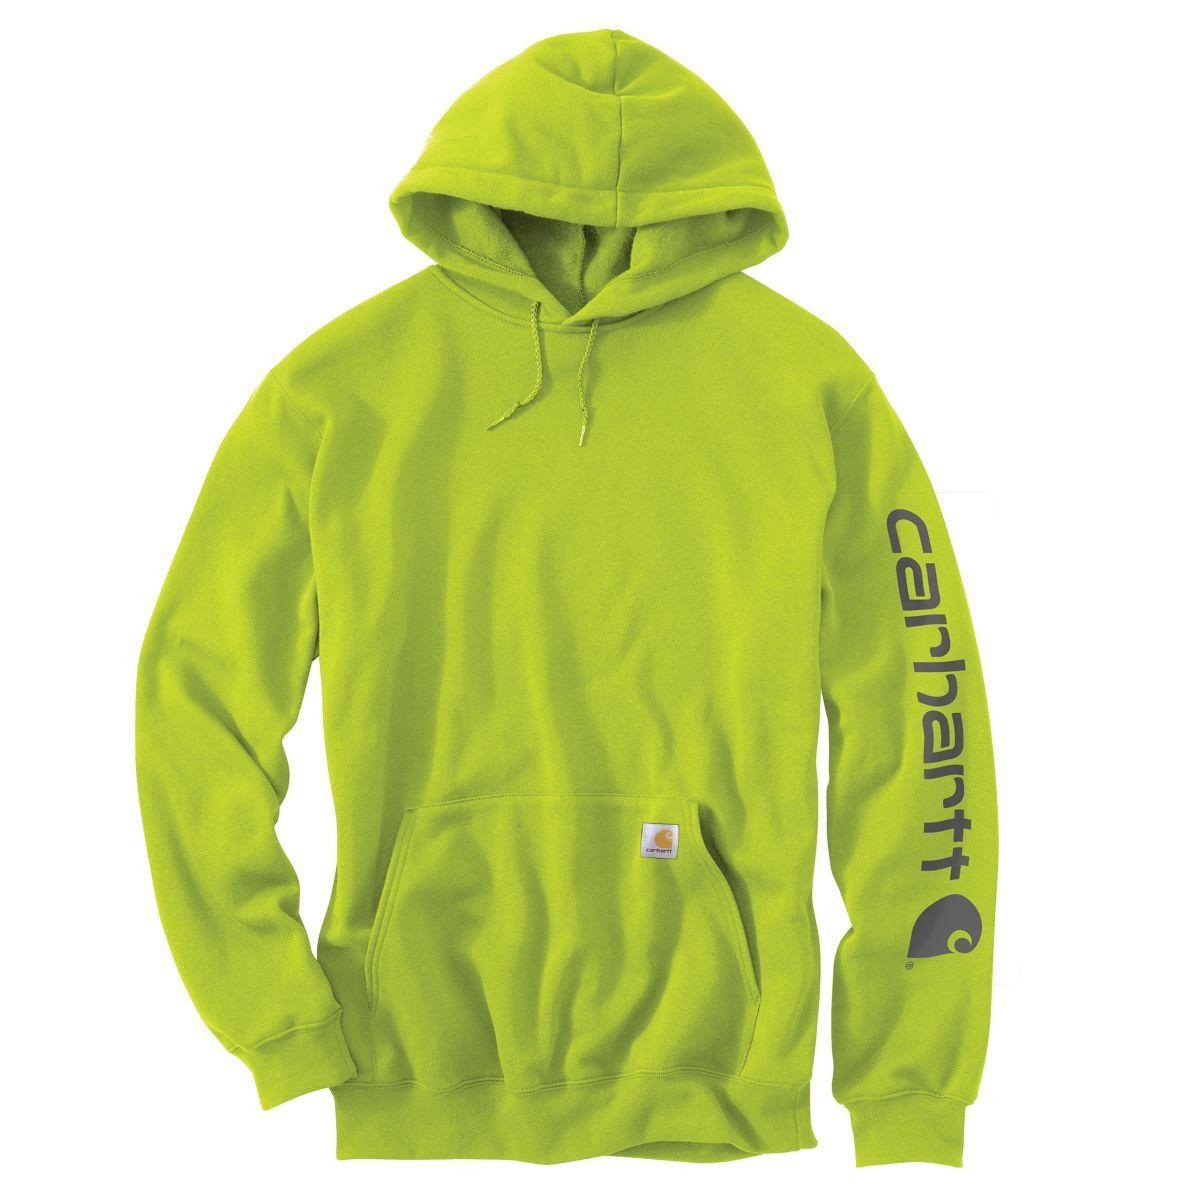 Carhartt Men S Sour Apple Midweight Signature Sleeve Logo Hooded Sweatshirt Carhartt Sweatshirts Sweatshirts Hooded Sweatshirts [ 1200 x 1200 Pixel ]